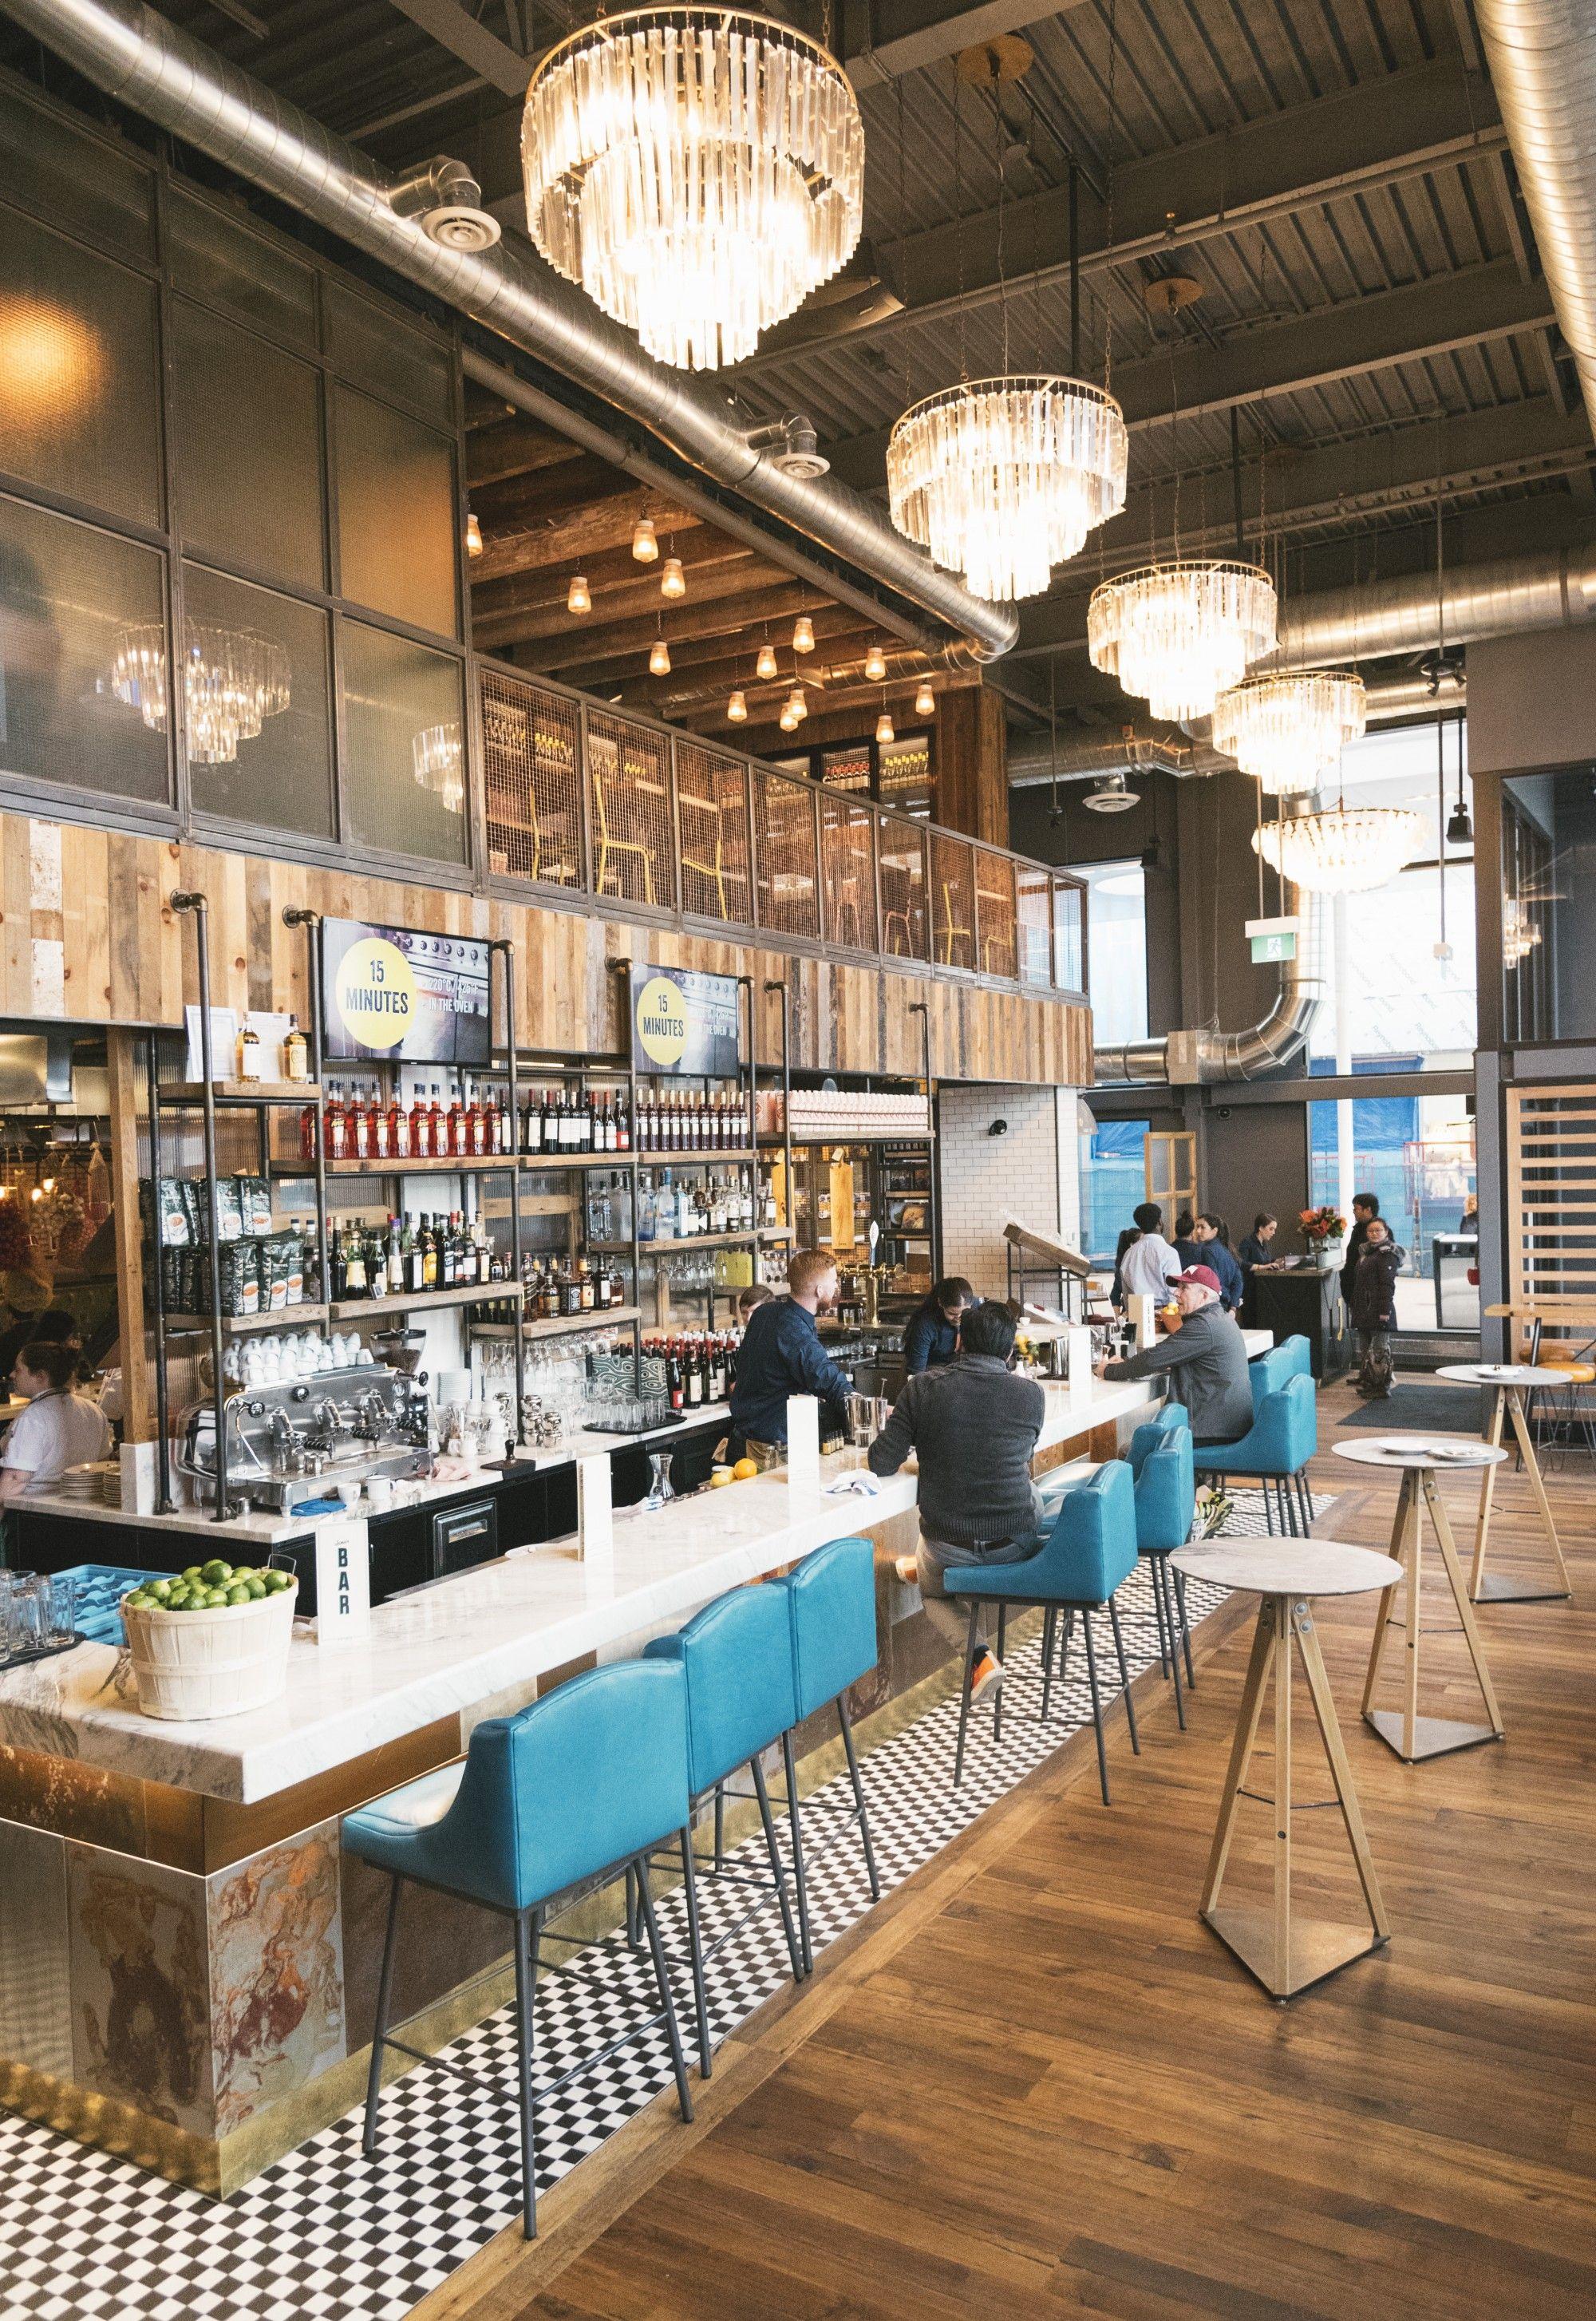 Best jamies restaurant ideas on pinterest jamie